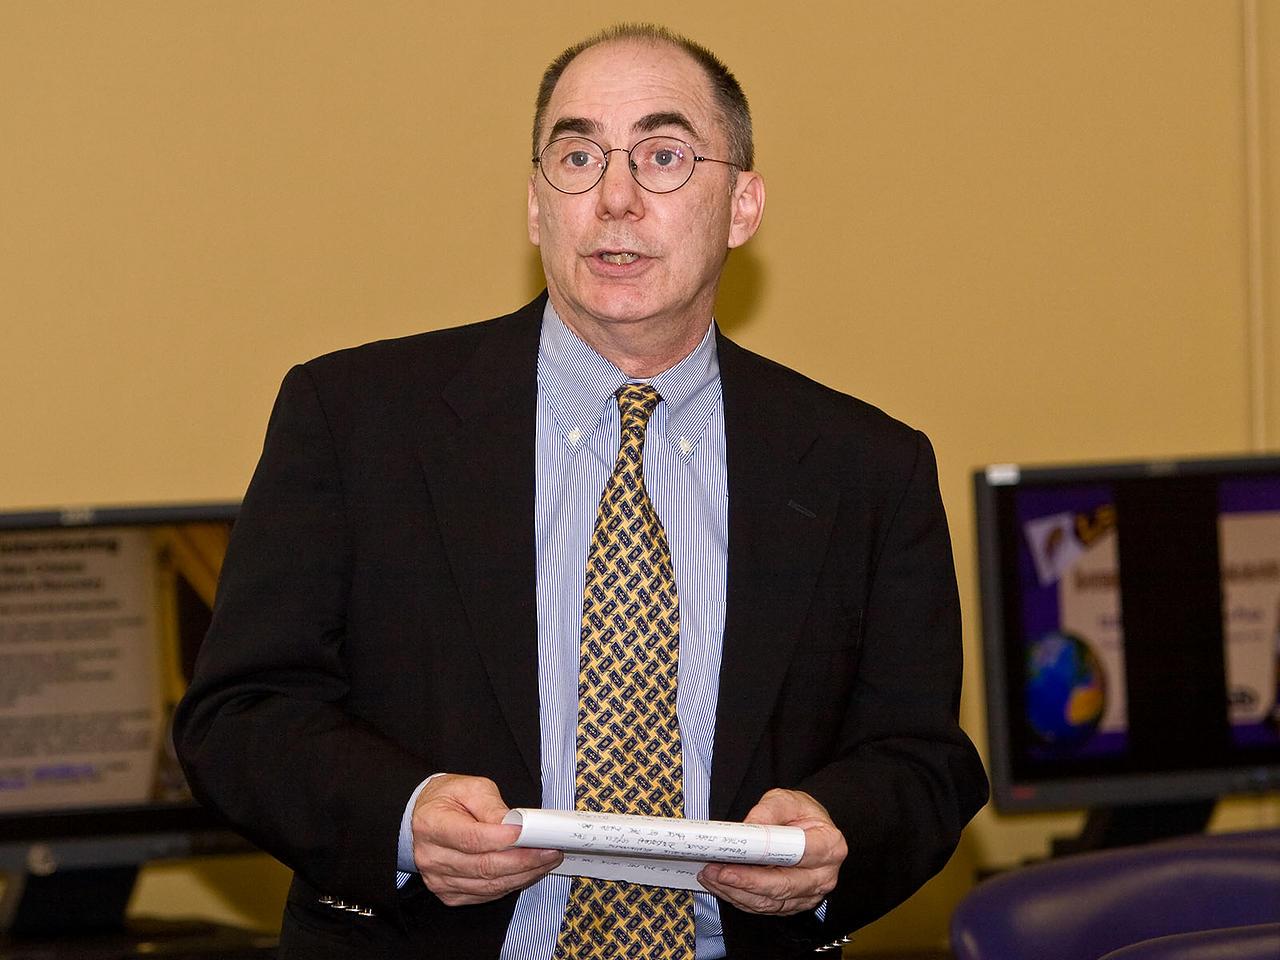 Pearson's President for Mathematics Greg Tobin presents the award